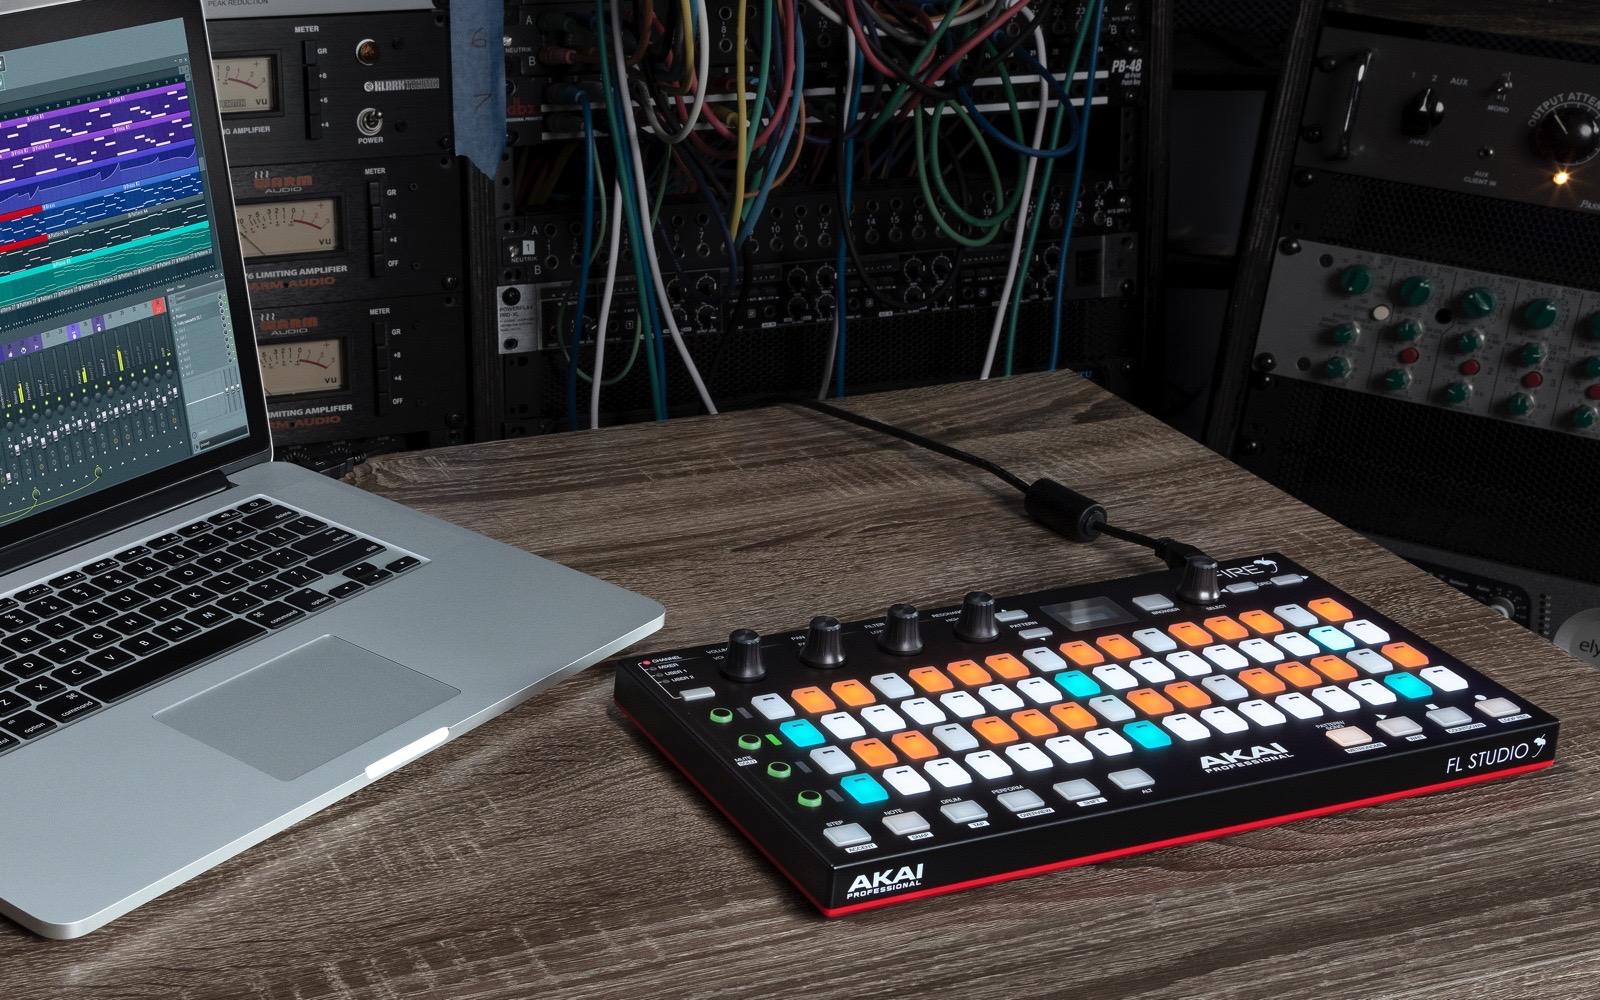 FL Studio gets its own dedicated music-making hardware